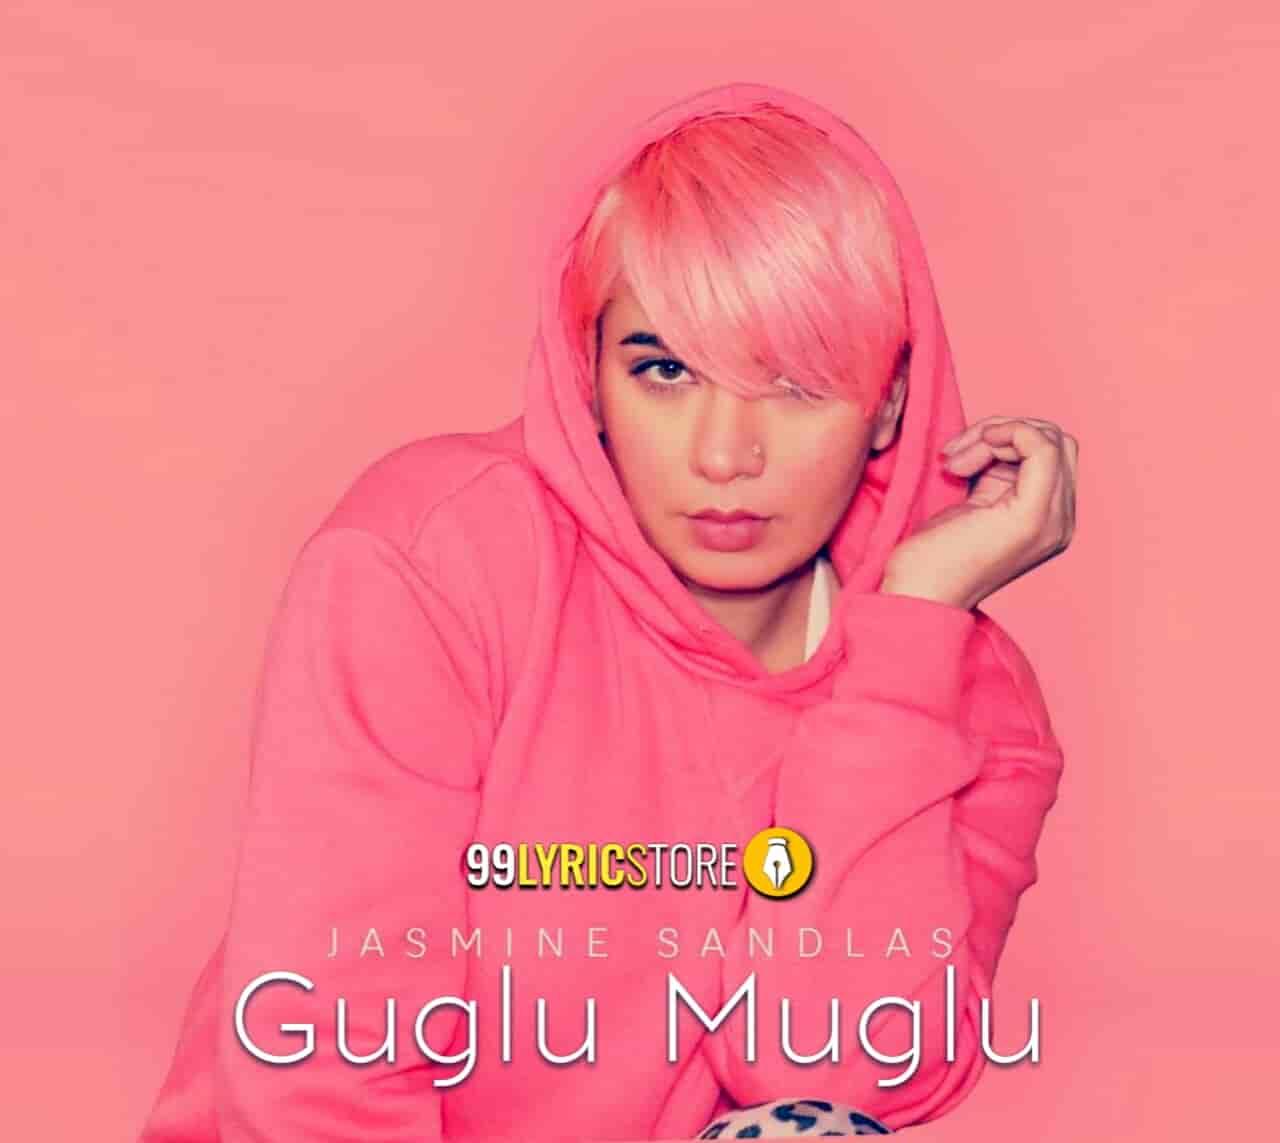 Guglu Muglu Song Images By Jasmine Sandlas